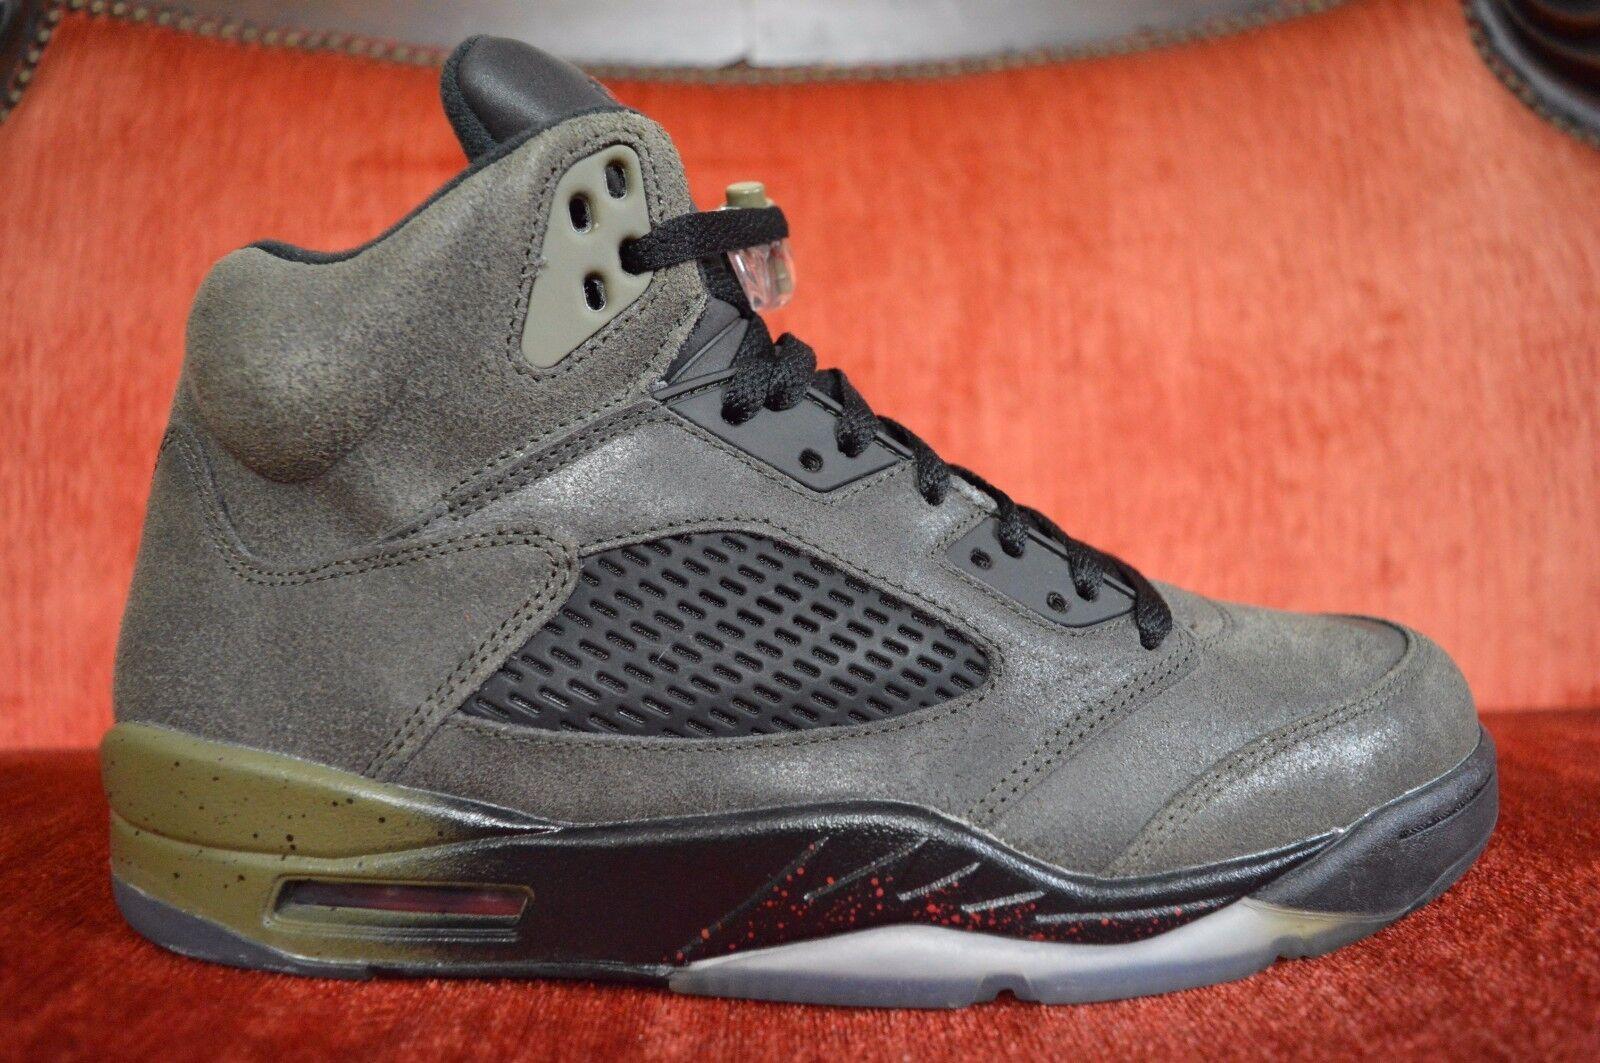 WORN TWICE Nike Retro Air Jordan 5 V Retro Nike Fear 626971-350 Size 10 Olive OG ALL c1190a